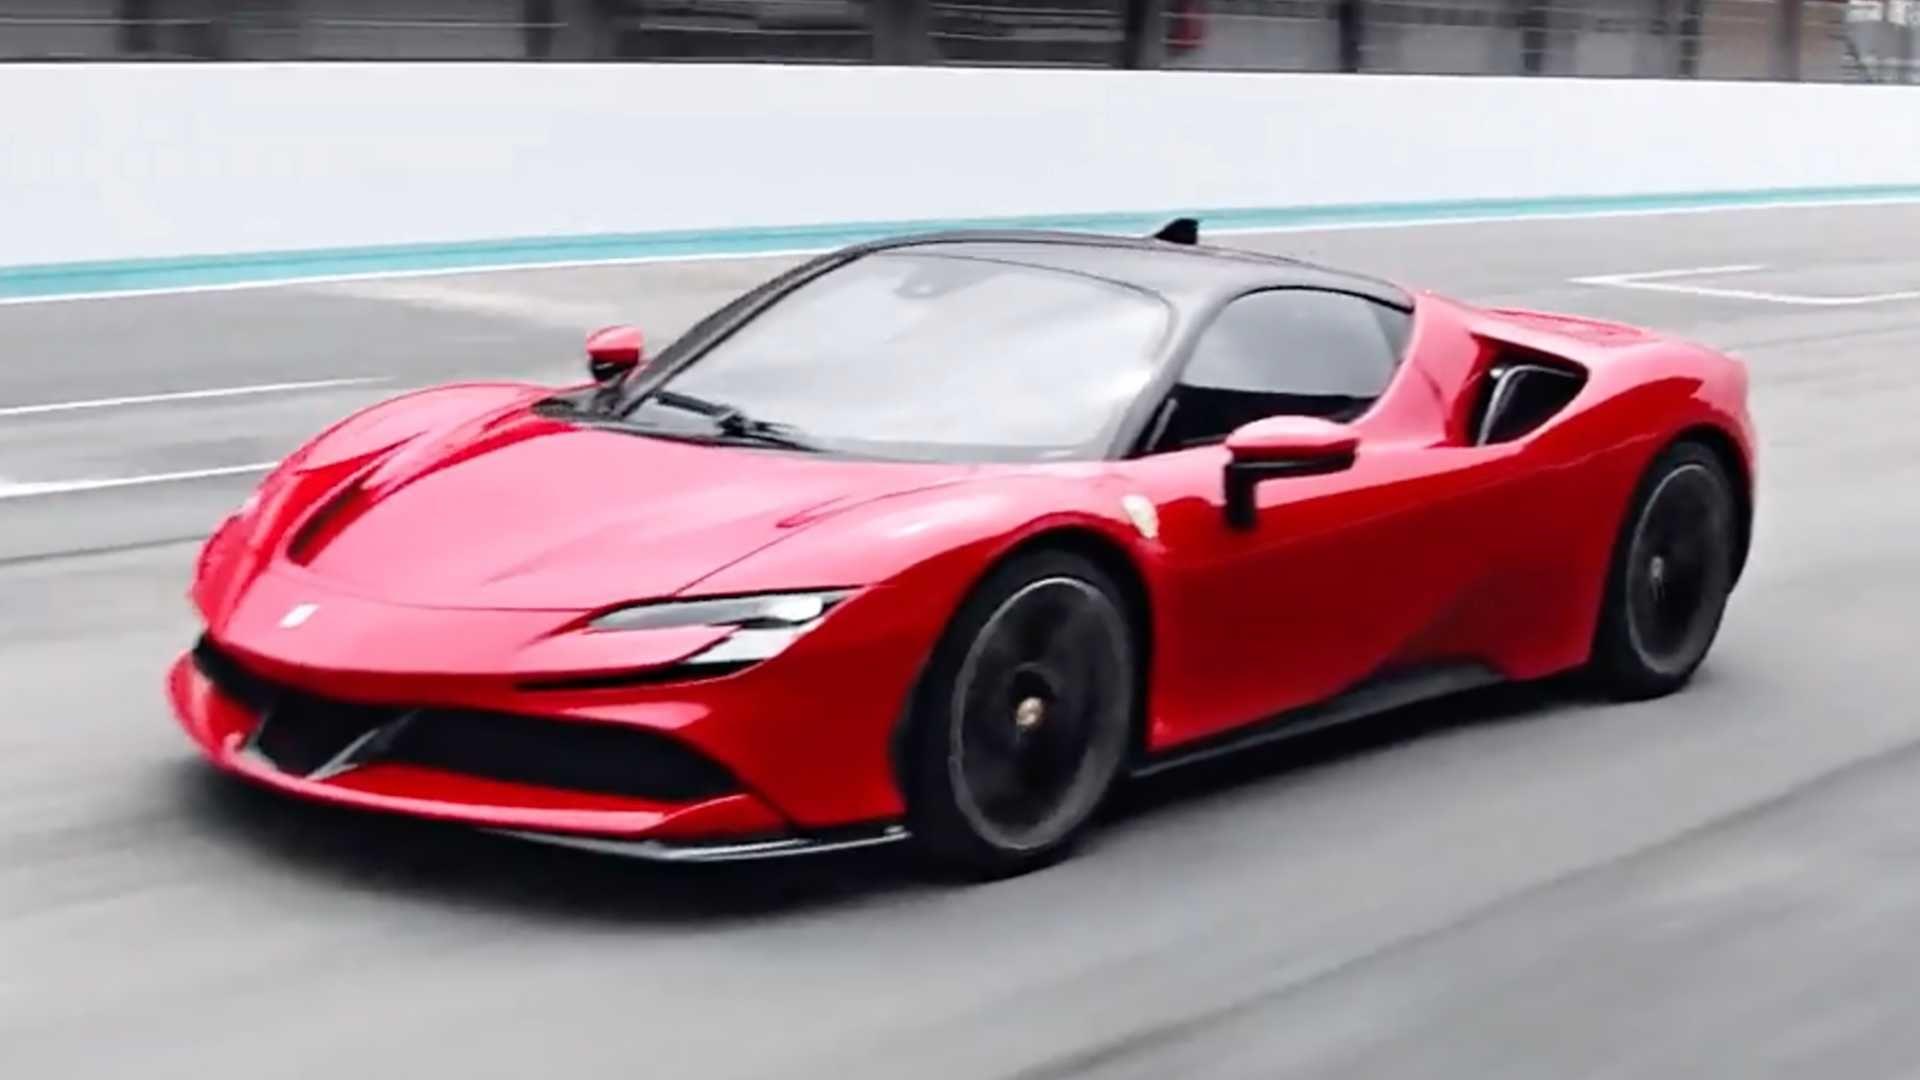 Ferrari Sf90 Stradale Unveiled A Hyper Hybrid With 986 Horsepower